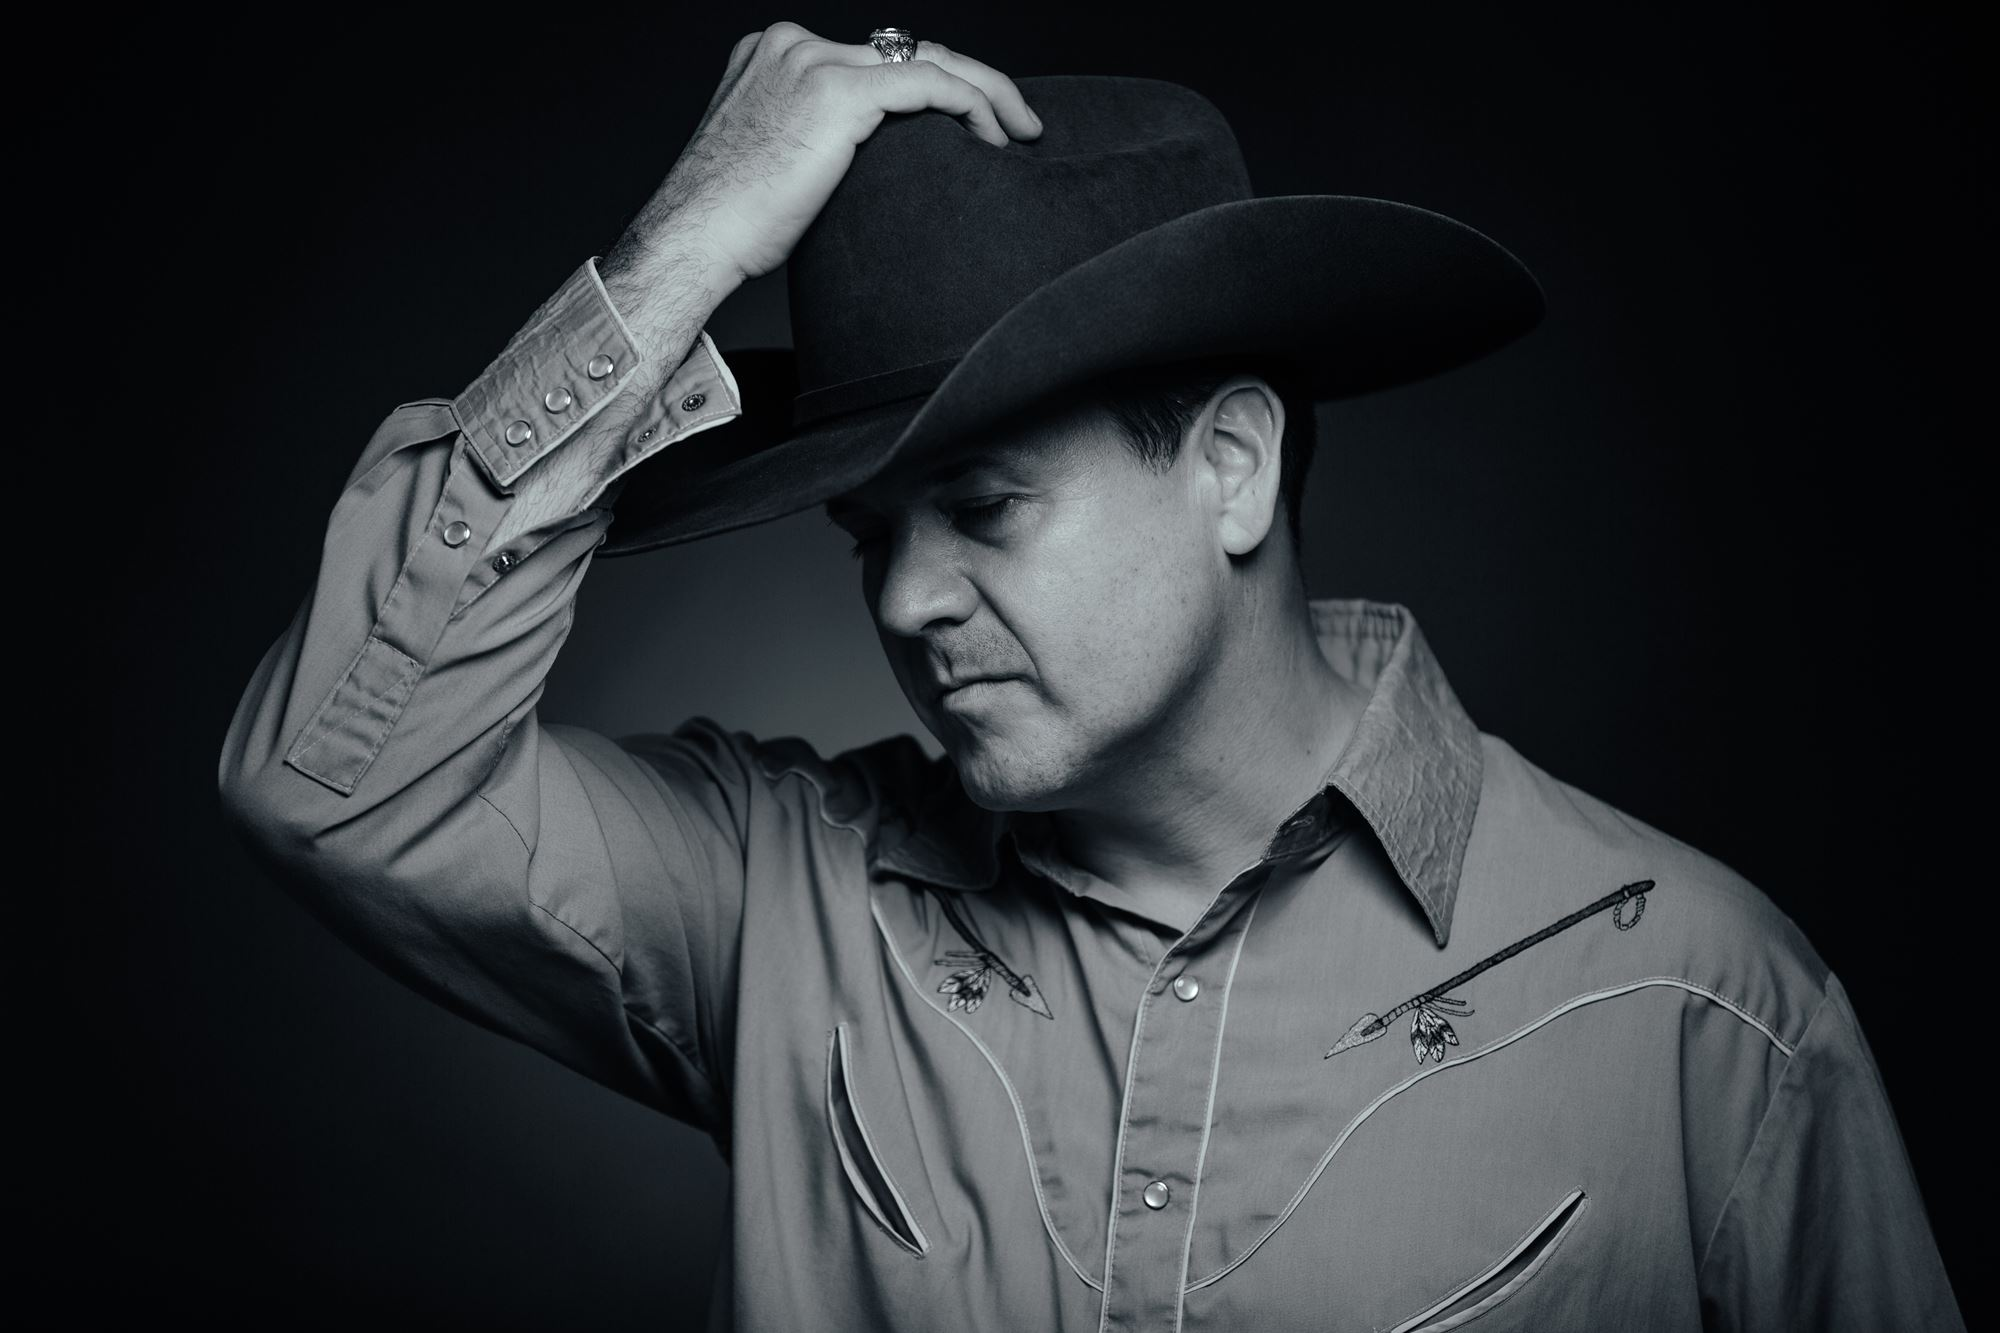 PRCA Rodeo w/ Roger Creager <br> Saturday, Feb. 13 at 7 PM